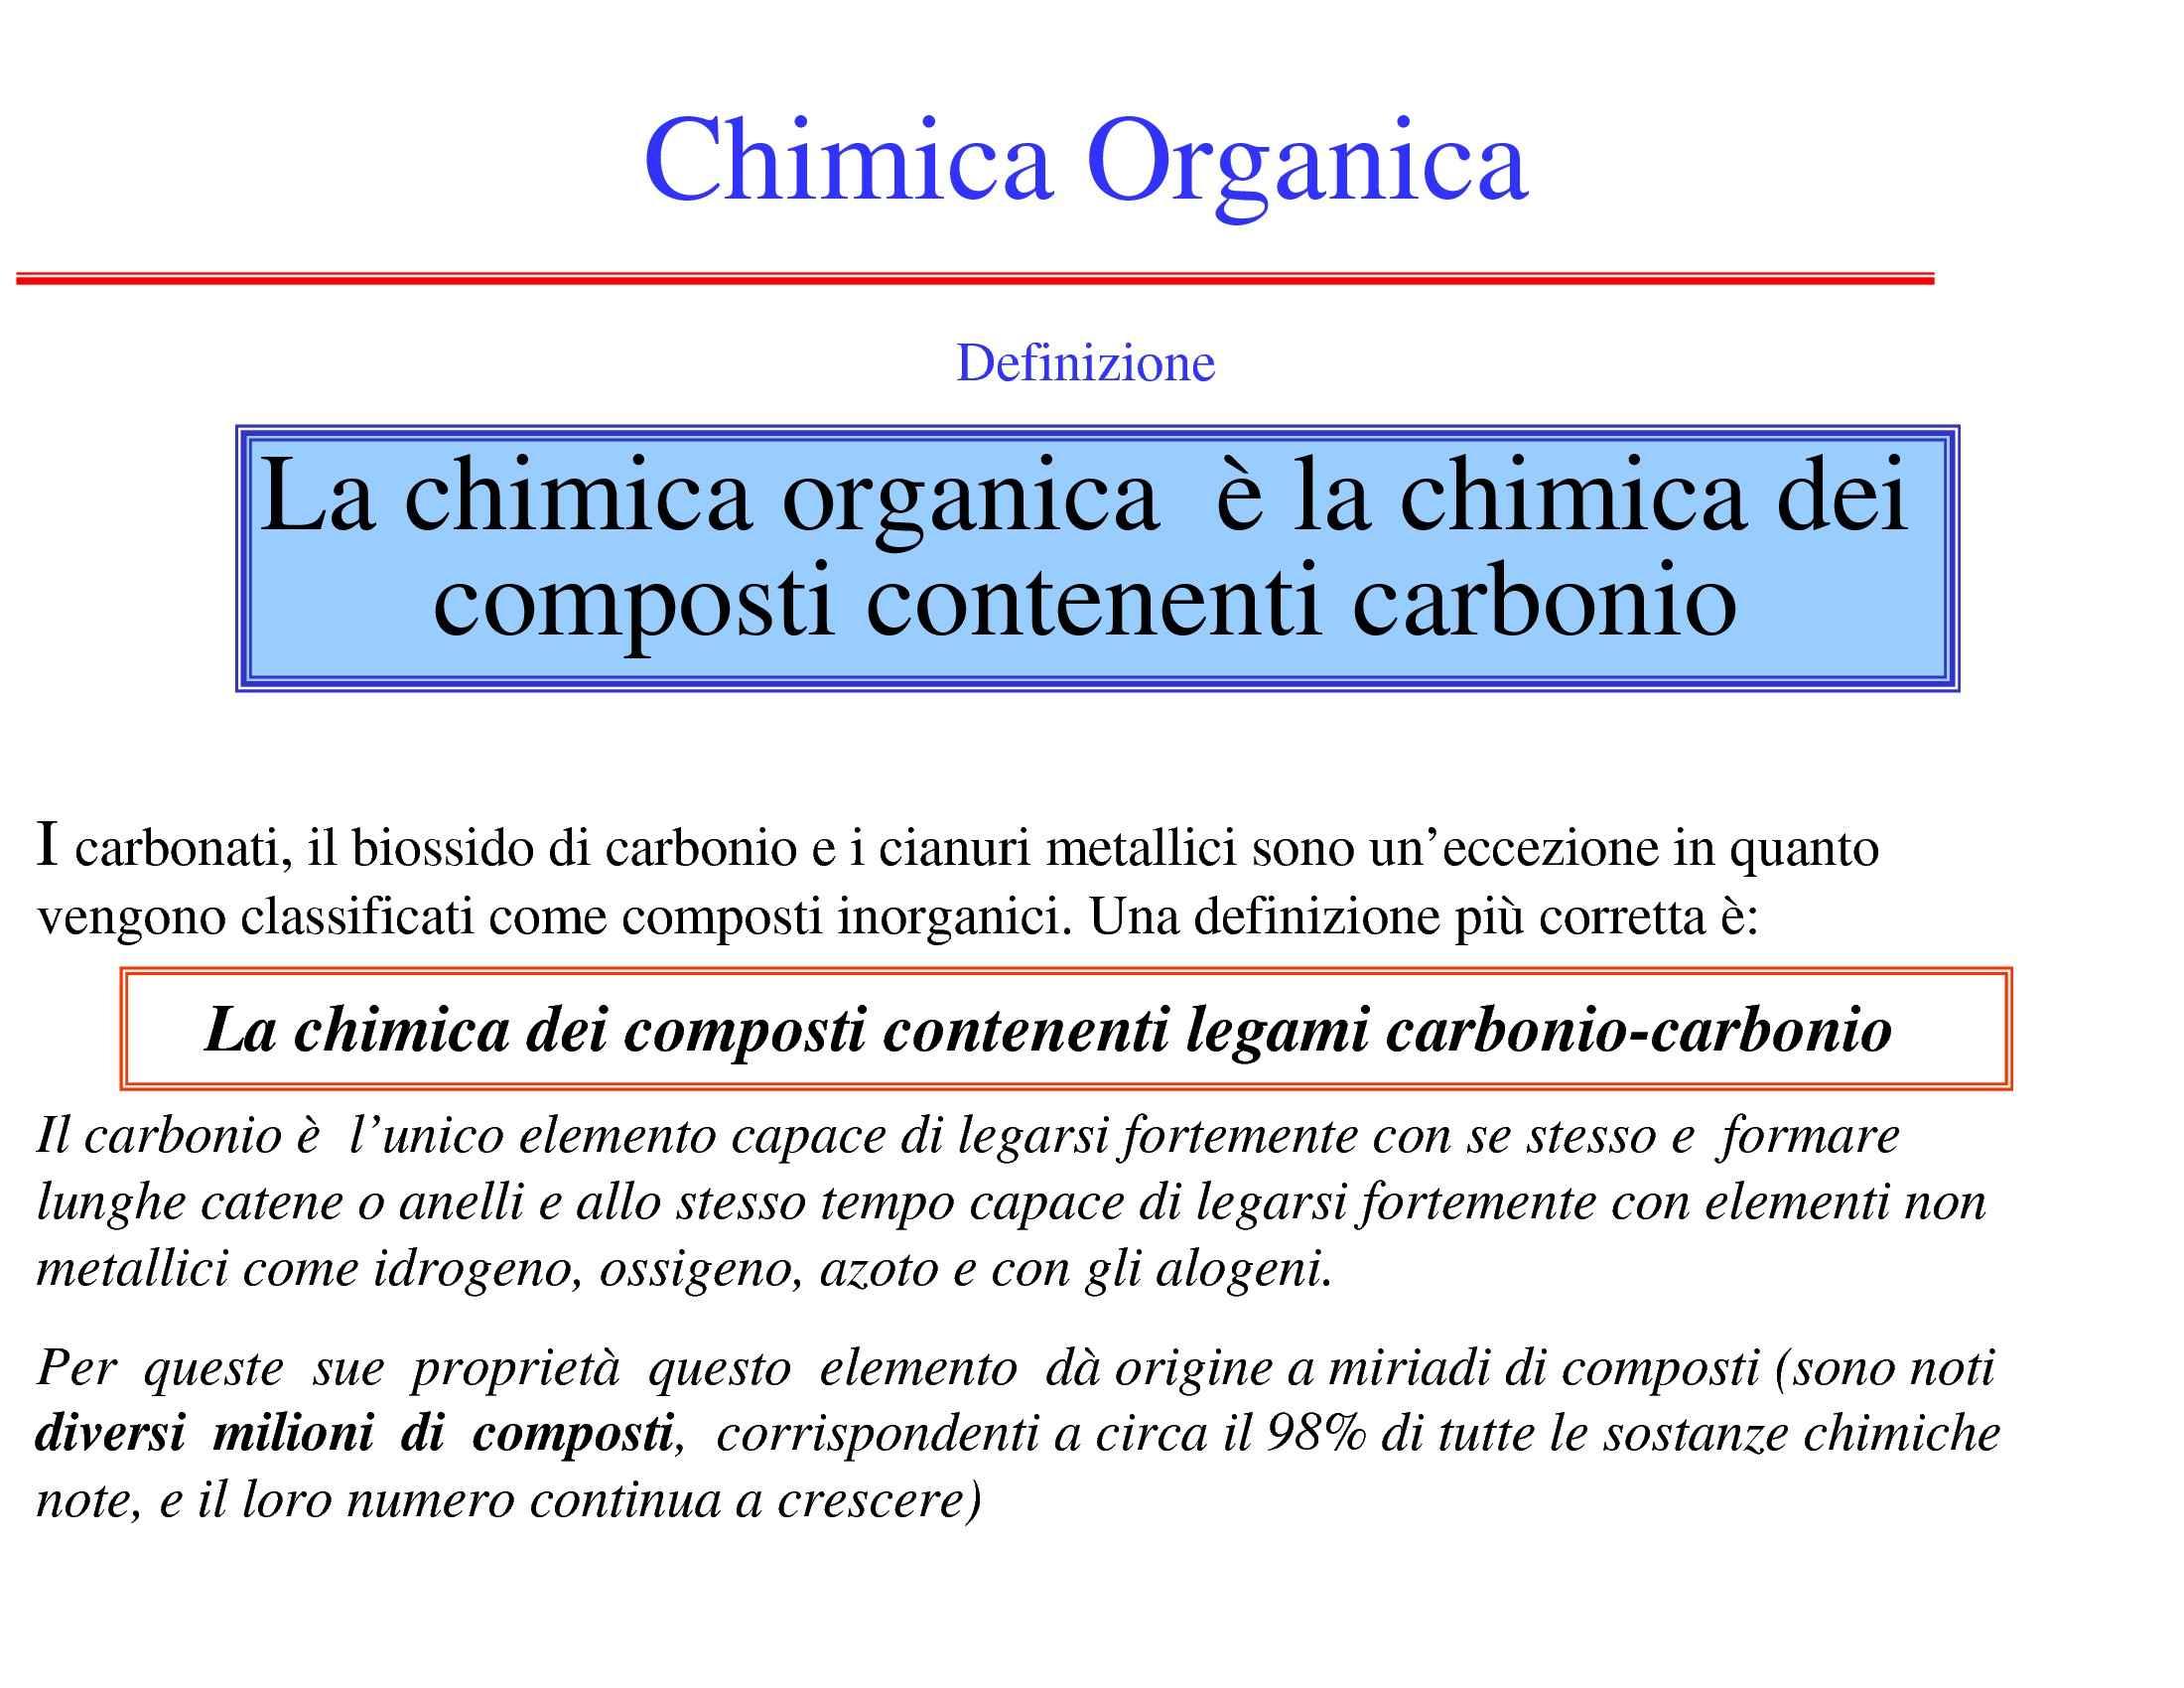 Chimica organica - Idrocarburi